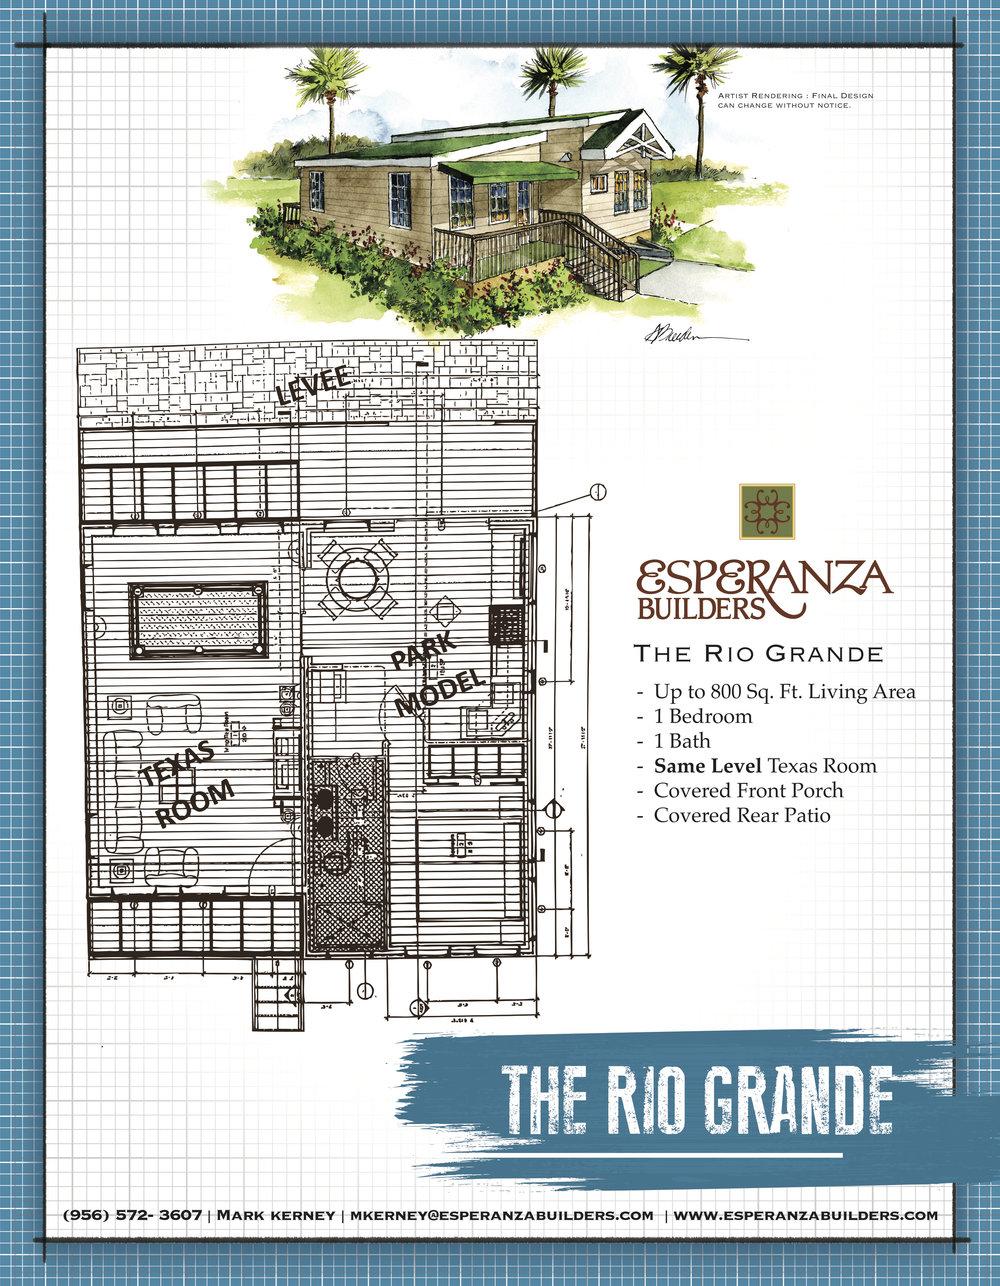 0119-07 Esperanza Group 8x5 Insert-TheRioGrande copy.jpg